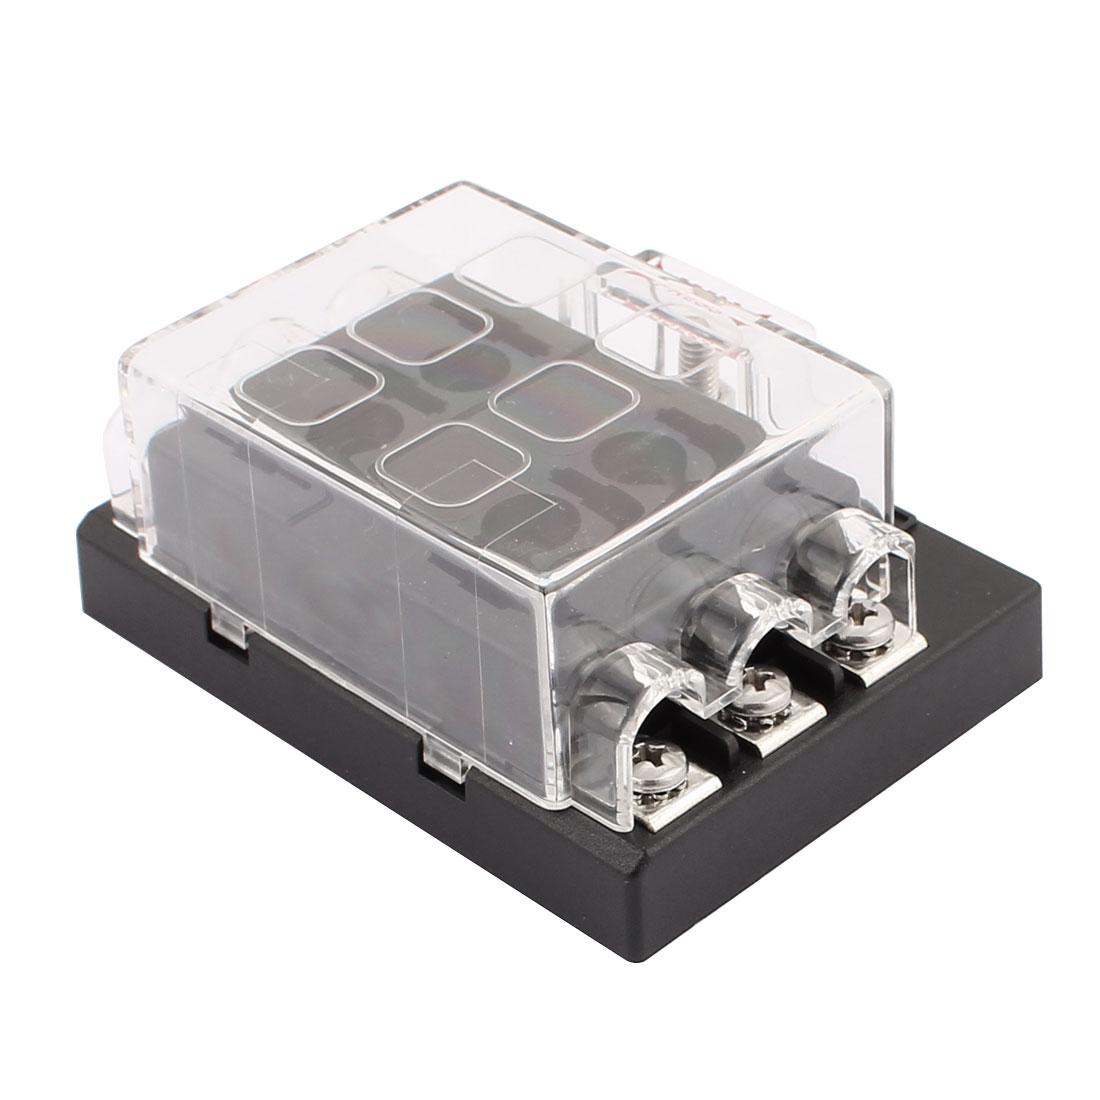 fuse blocks car wiring harness box dc32v 6 way terminals circuit atc ato car suv auto fuse box block holder